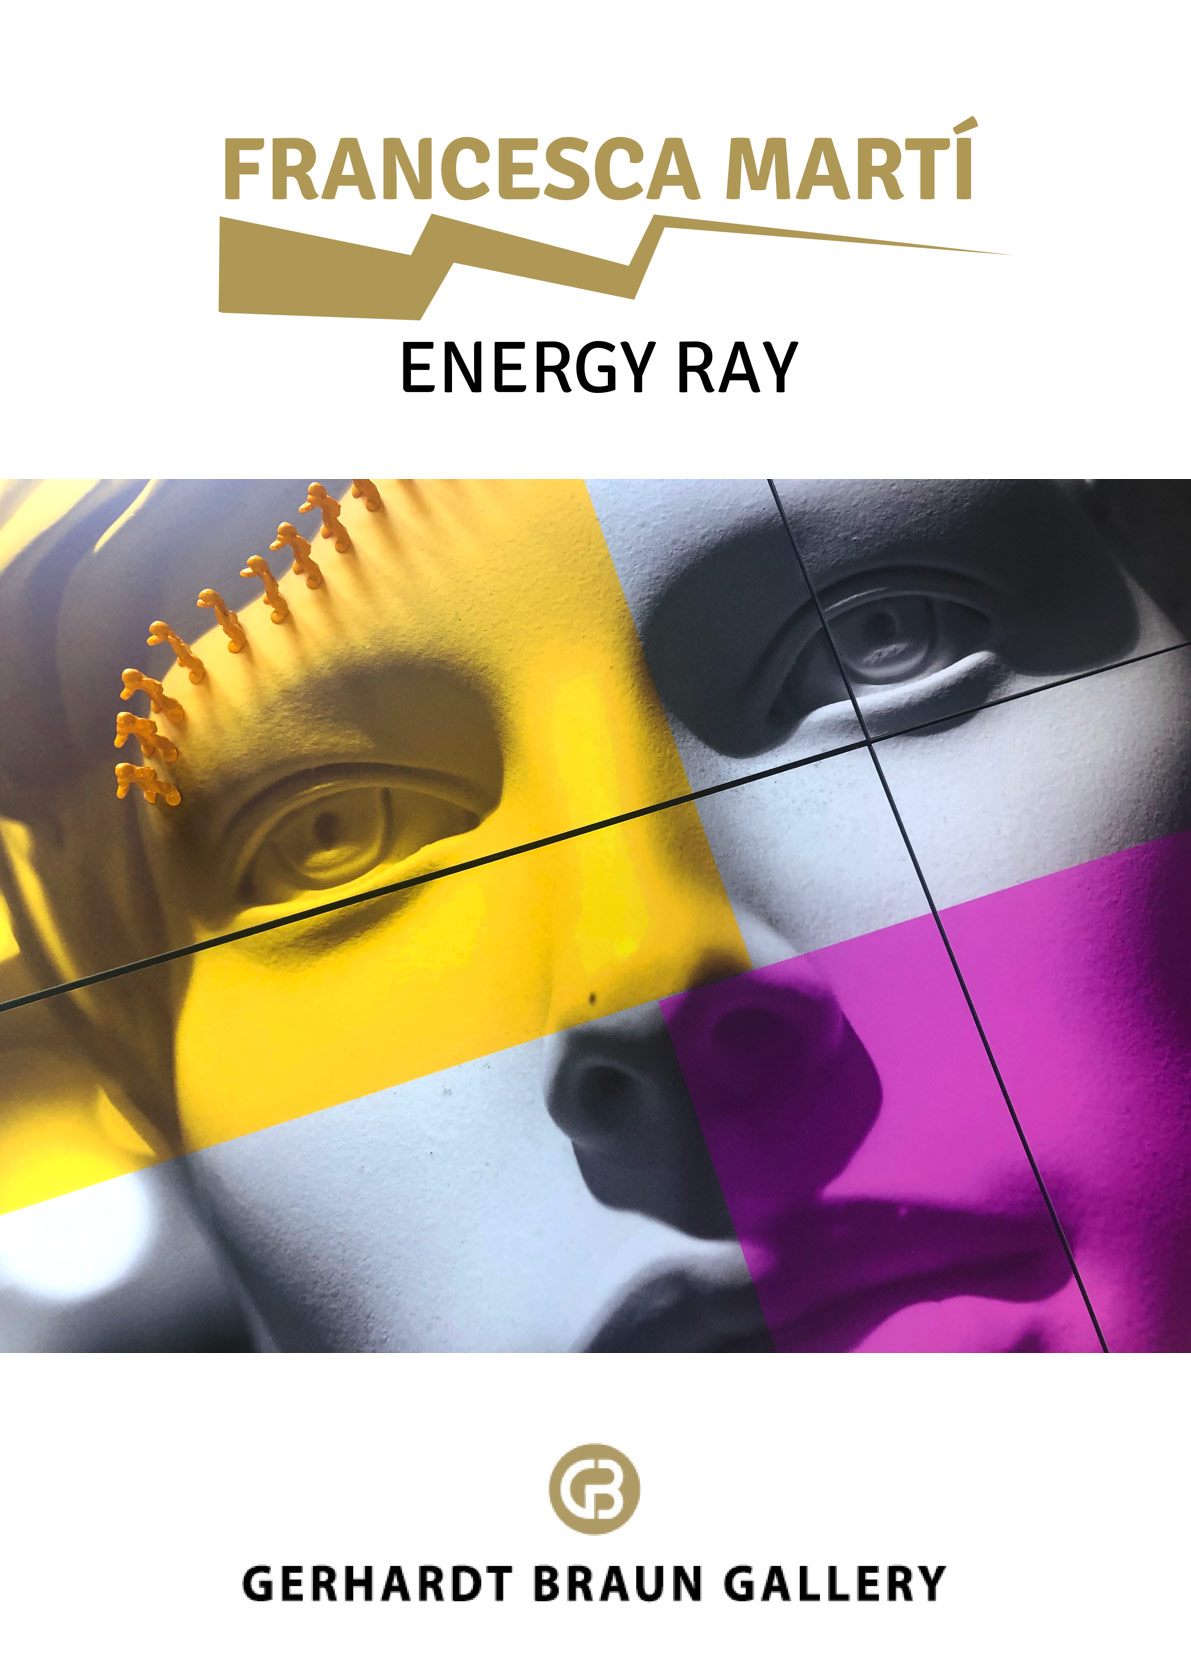 energy-ray-francesca-marti